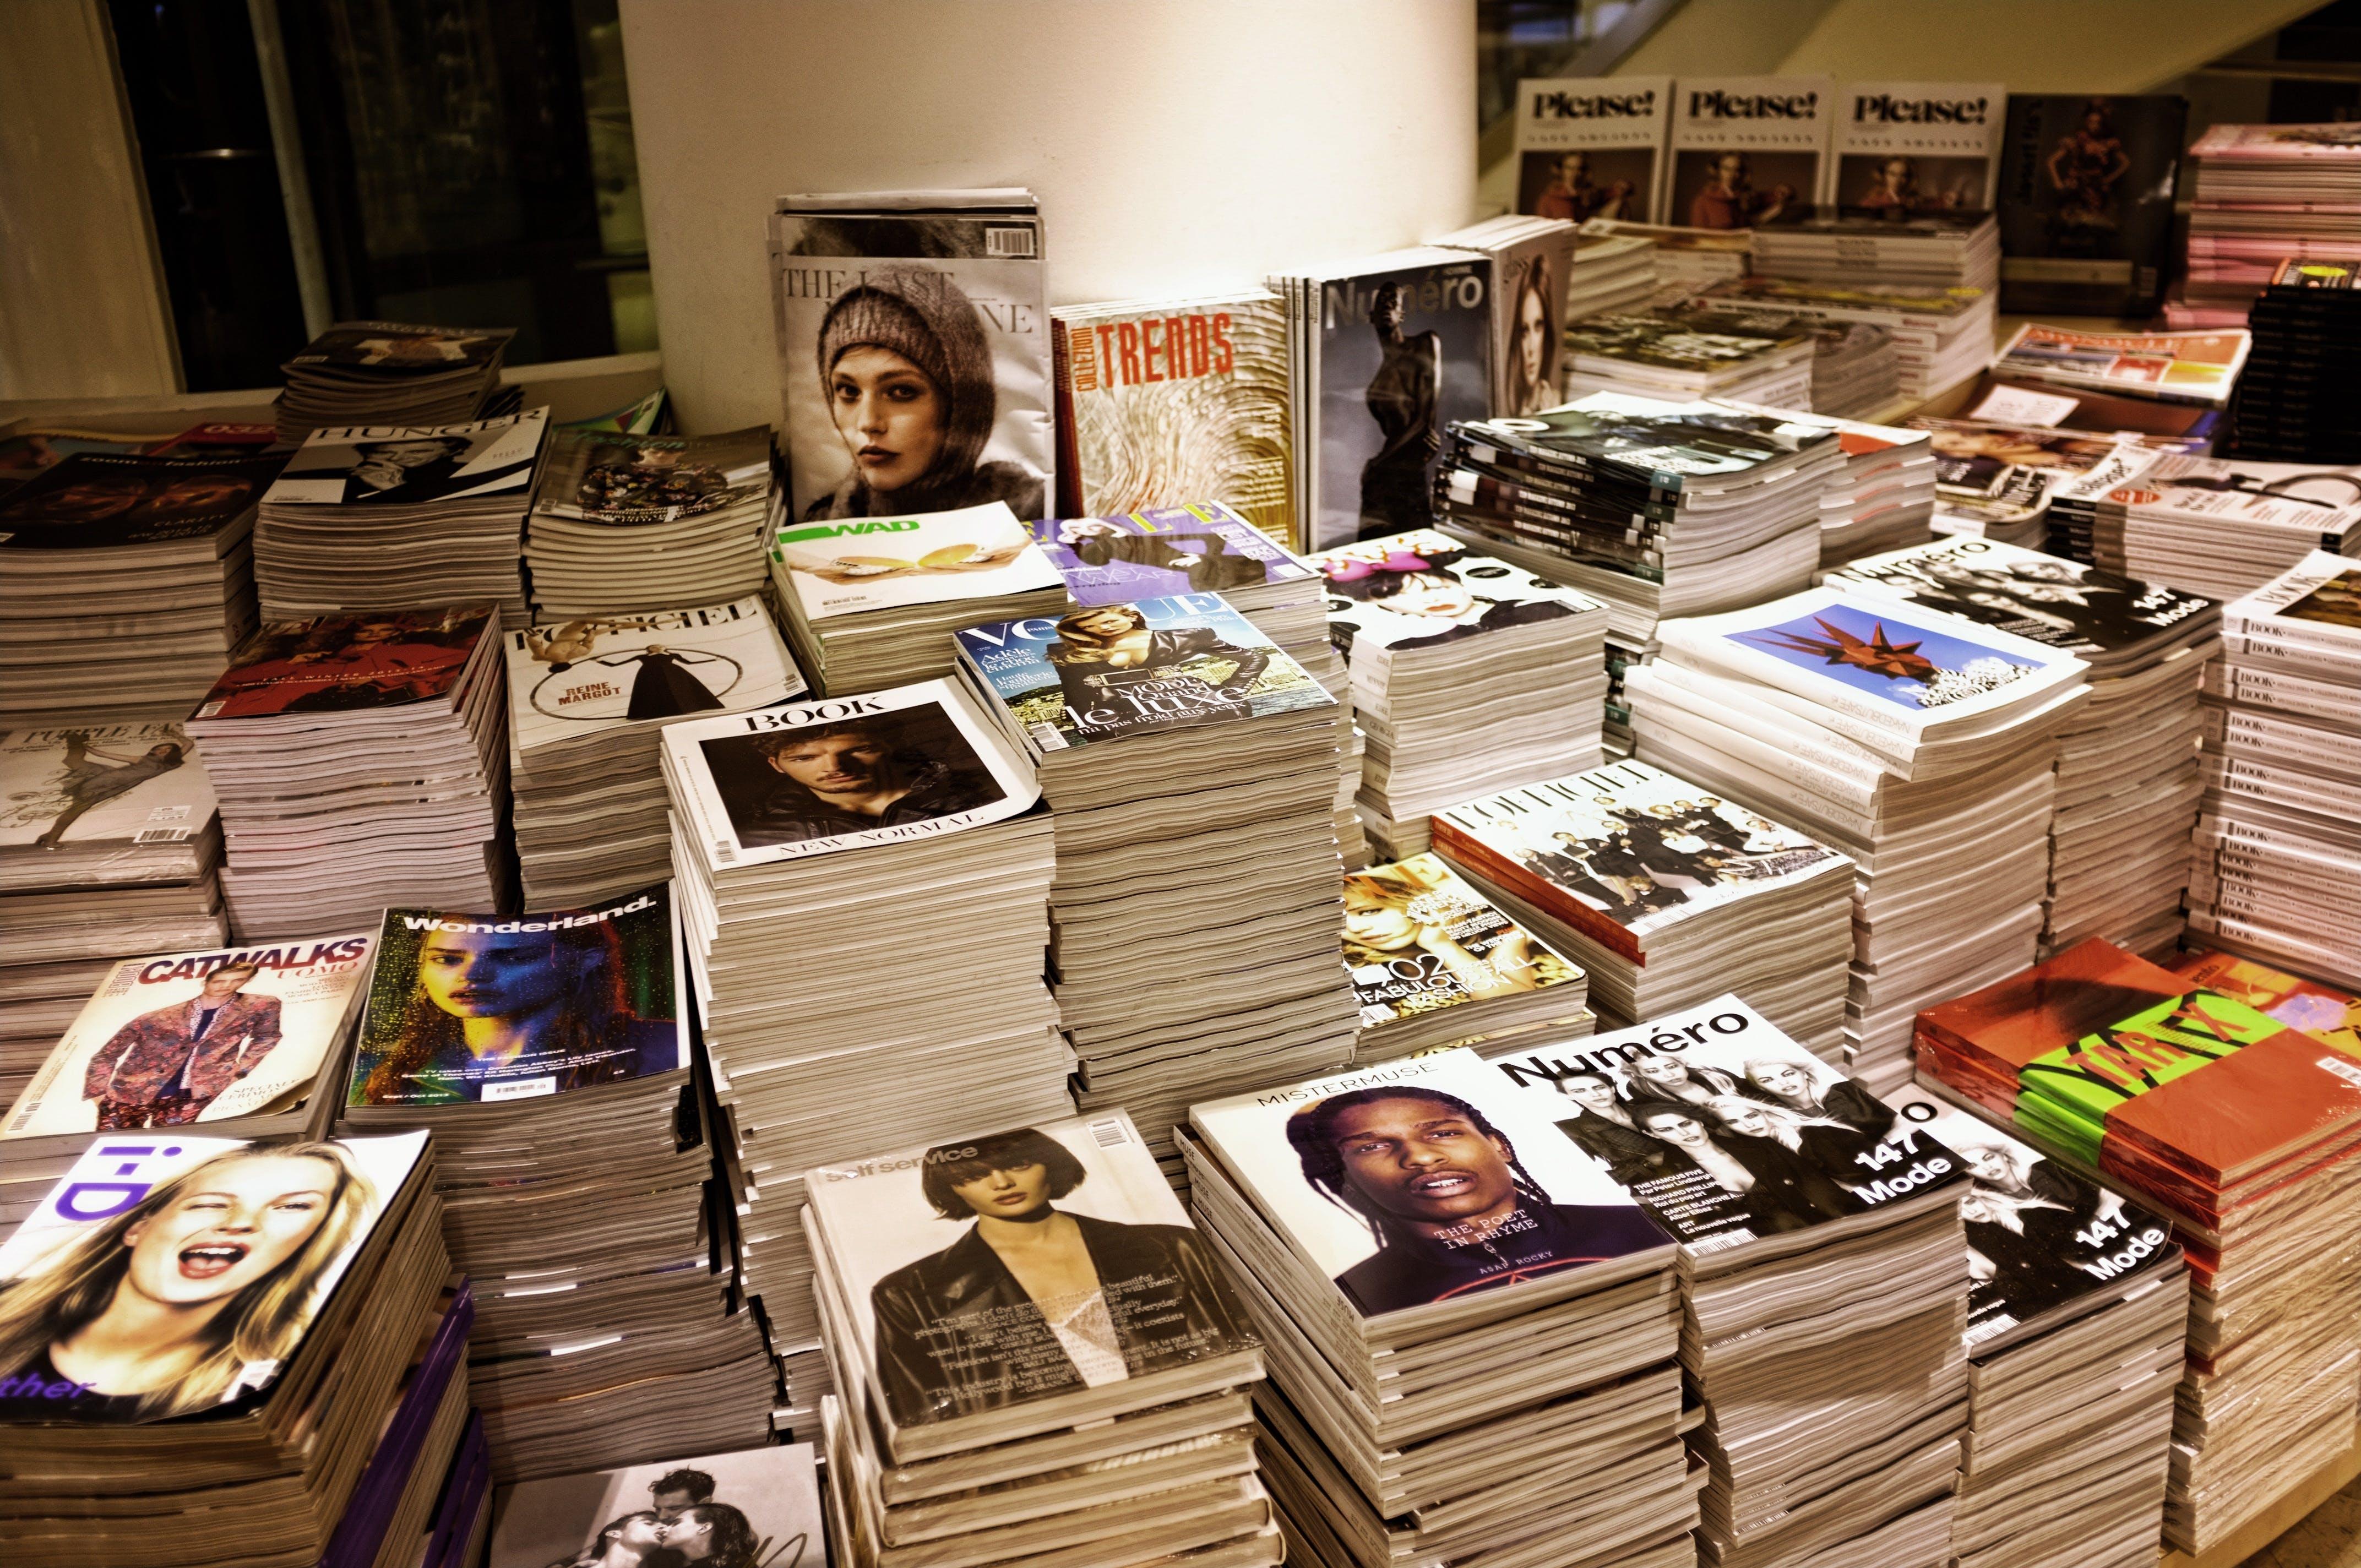 Kostnadsfri bild av bibliotek, böcker, bokhandel, bokstapel